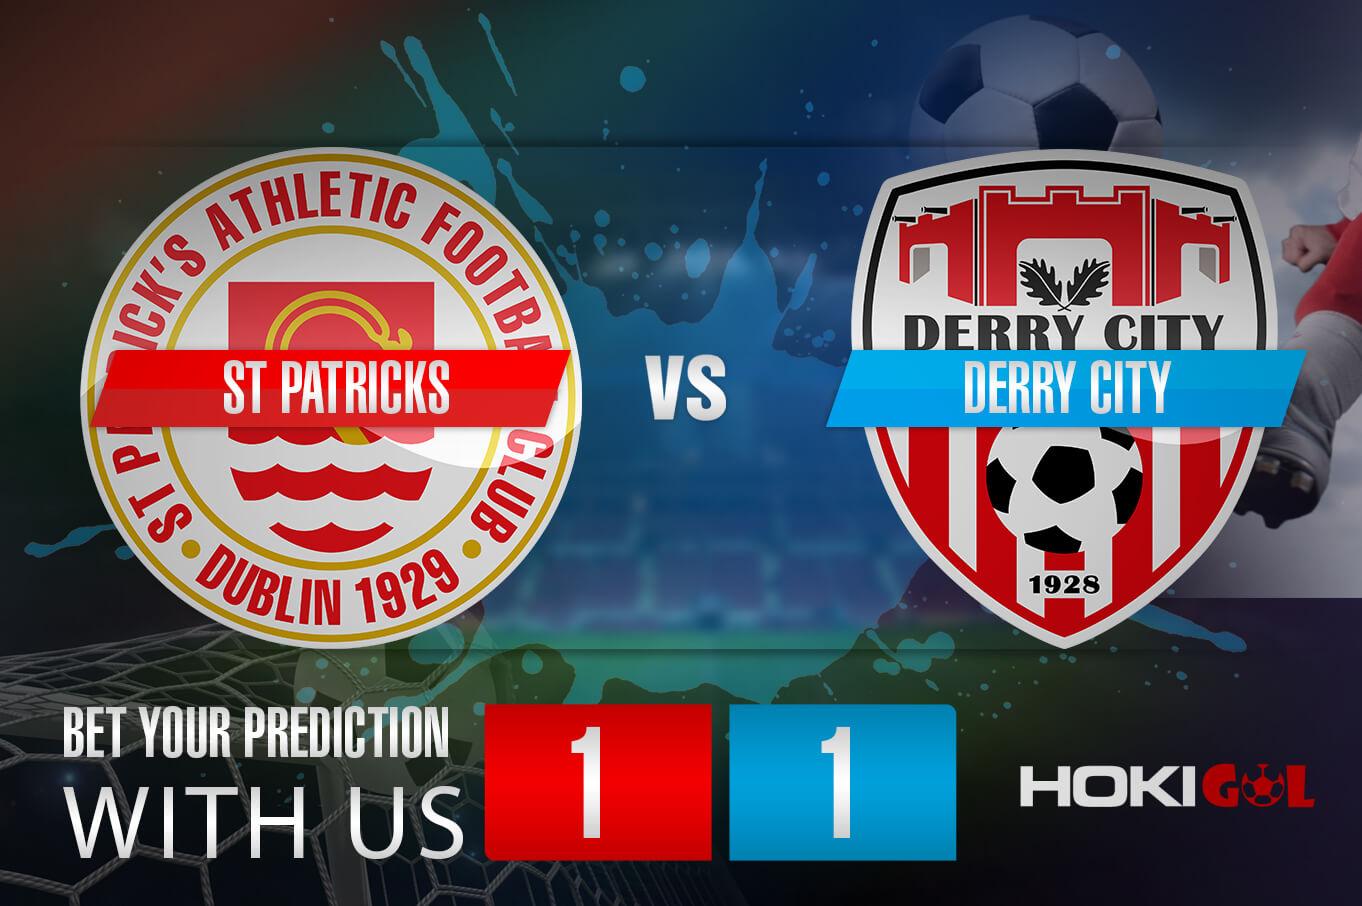 Prediksi Bola St Patricks Vs Derry City 10 Juli 2021